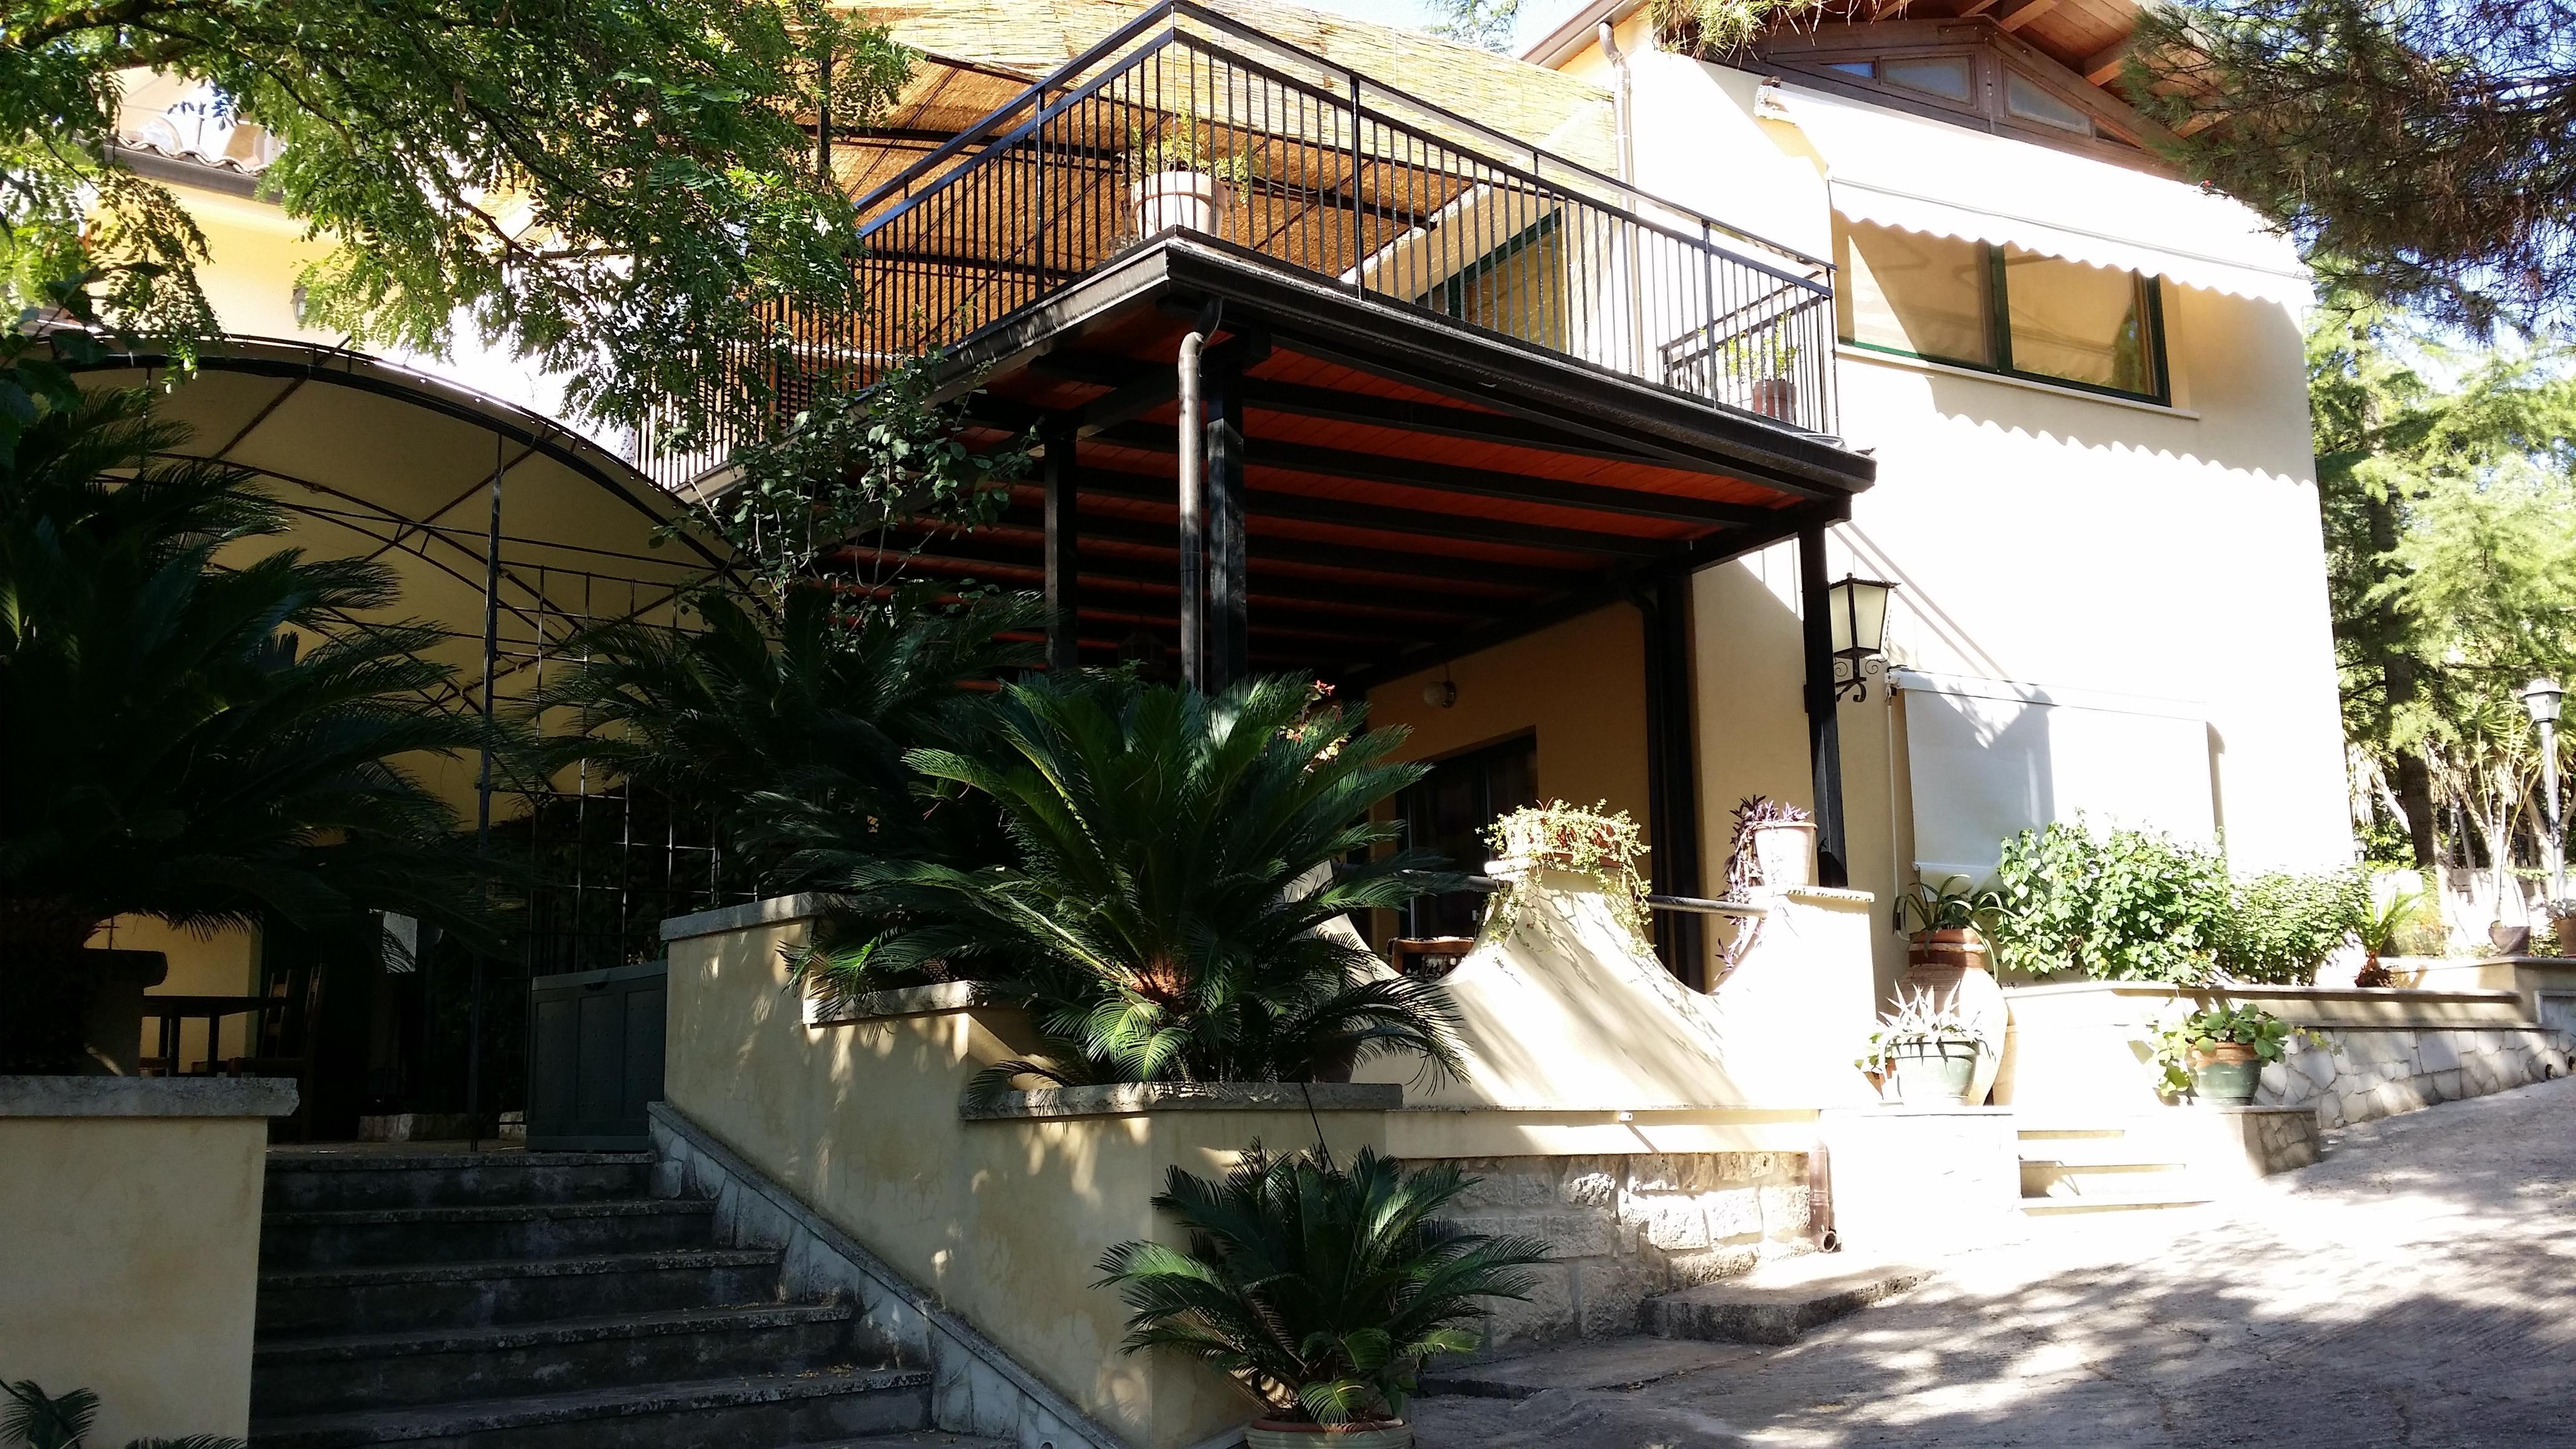 Appartement de vacances Bellavista (1730194), Modica, Ragusa, Sicile, Italie, image 23